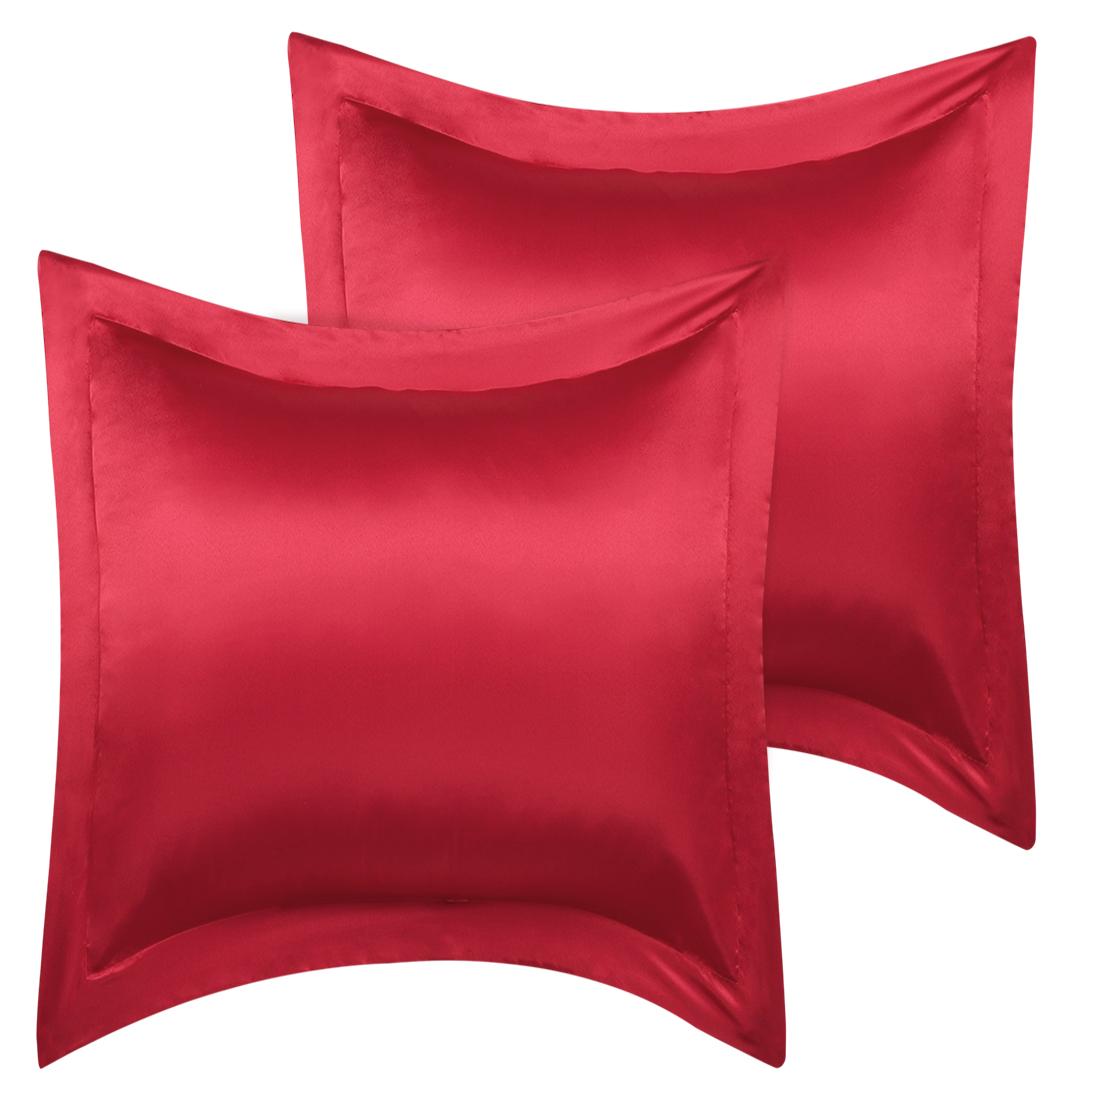 2 Pcs Wine Red Pillow Shams Satin Pillow Cases European Oxford Pillowcases